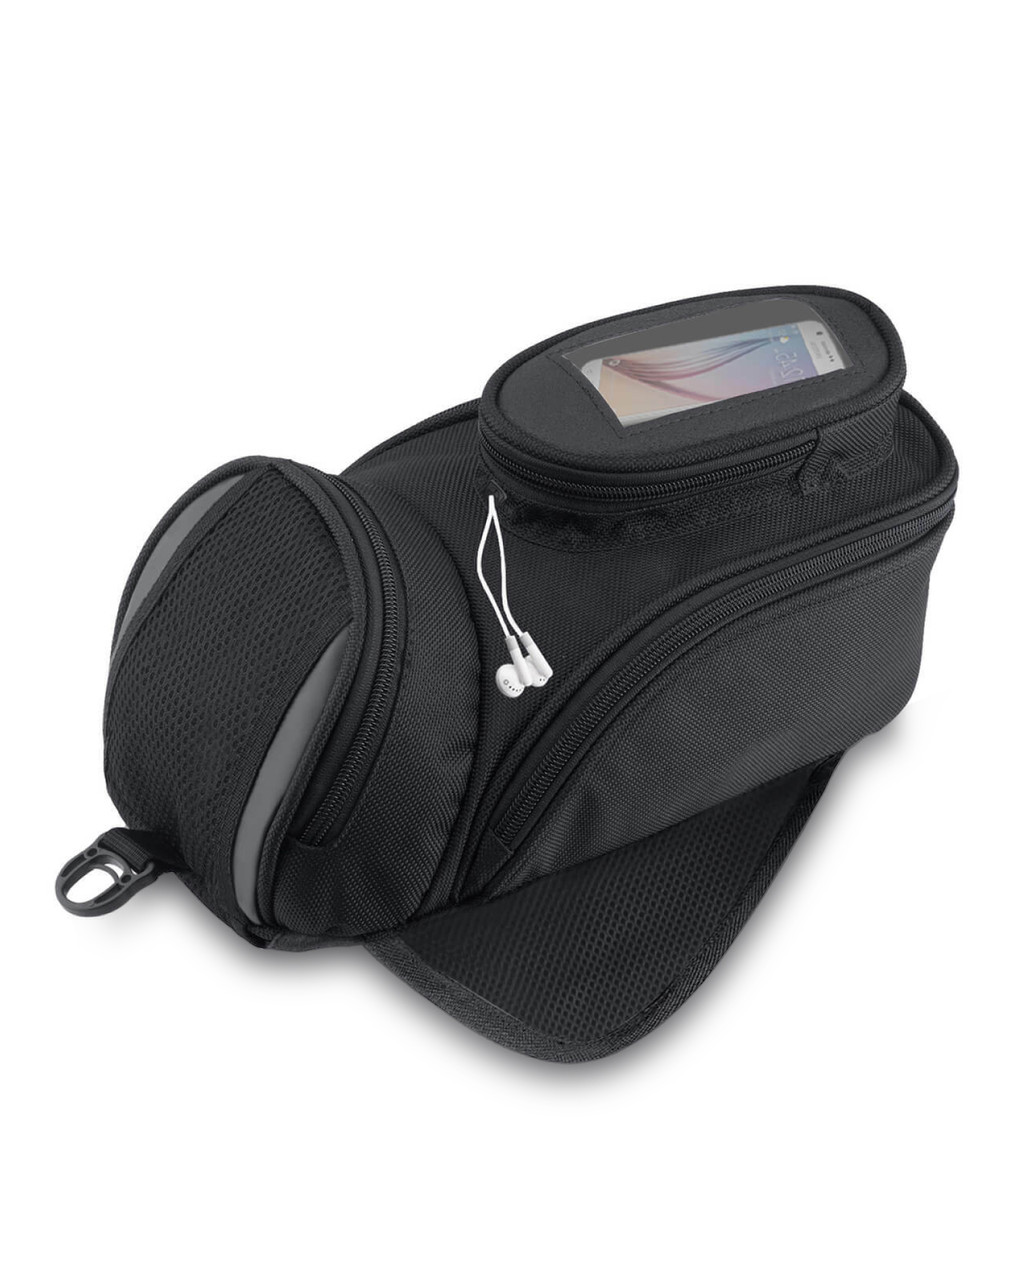 VikingBags Survival Series Kawasaki Magnetic Motorcycle Tank Bag Main Bag View